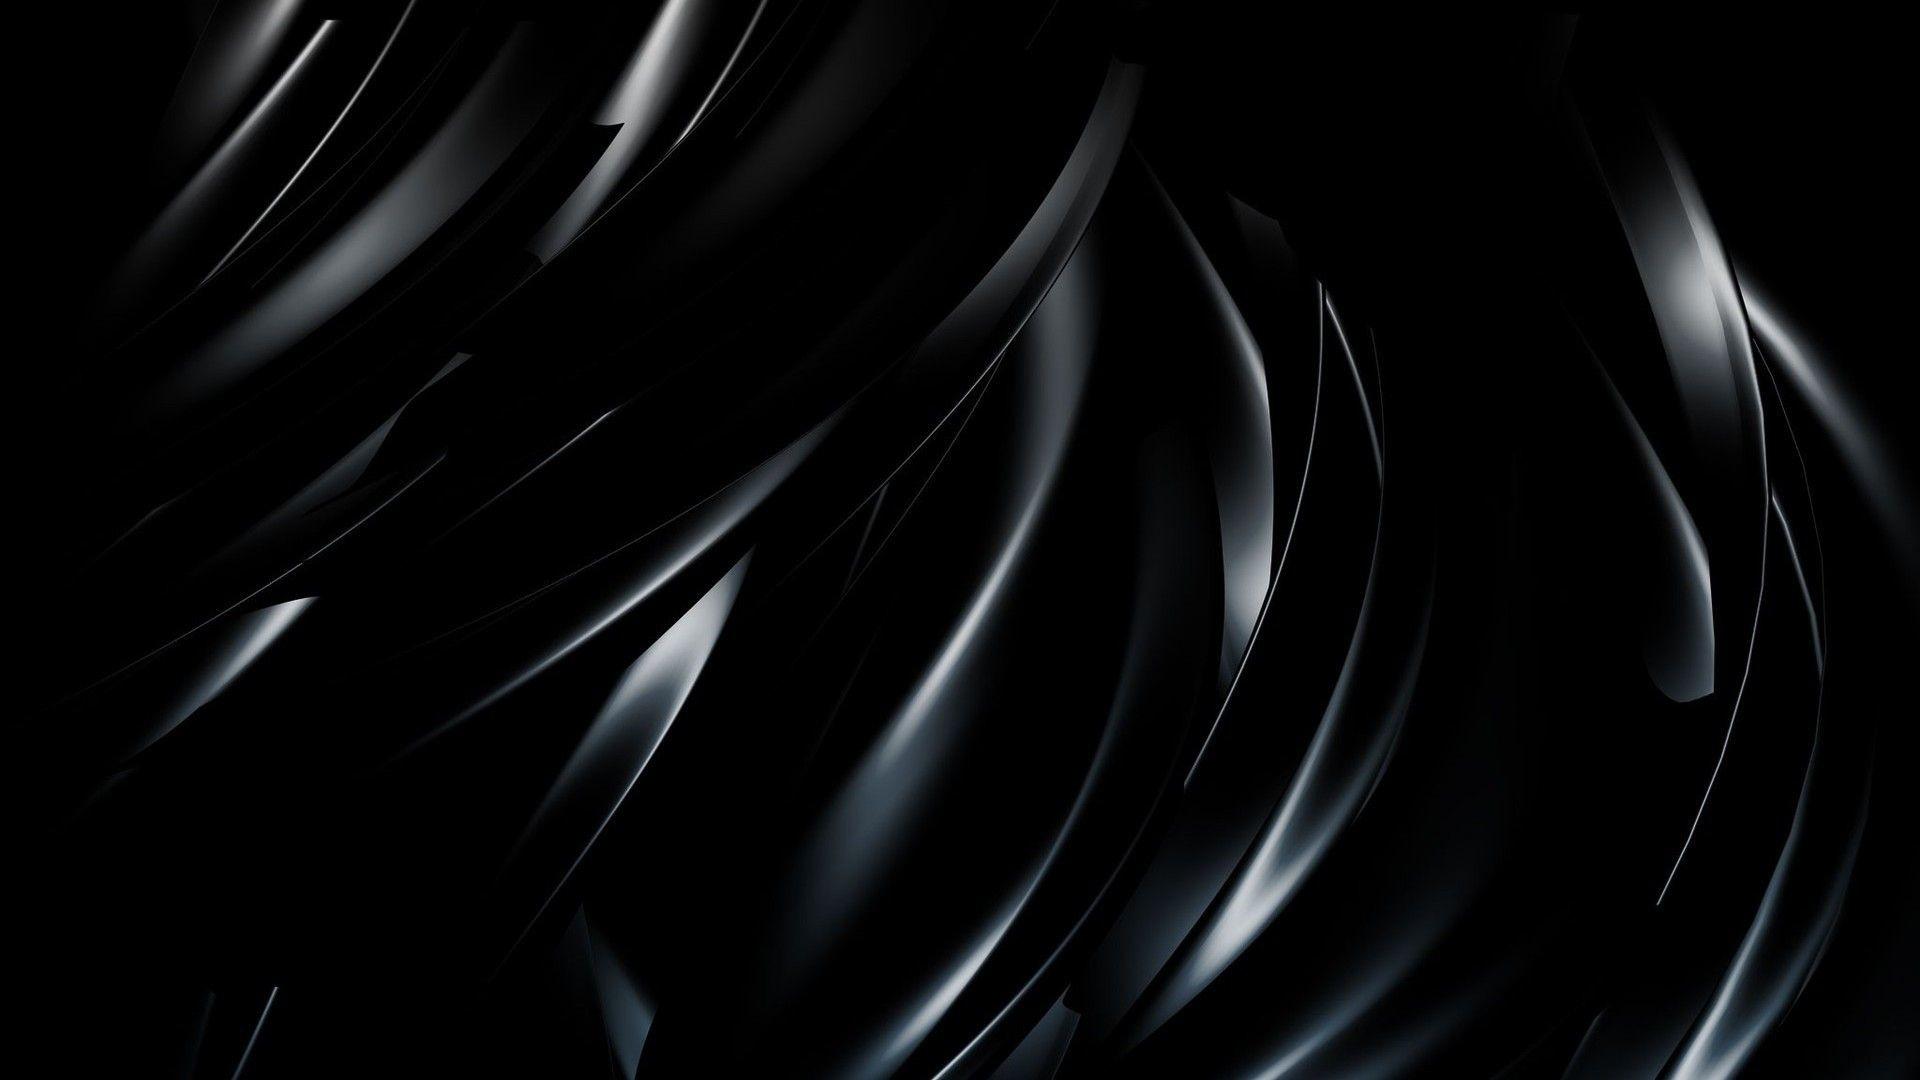 Black Abstract Desktop Background HD 1920×1080